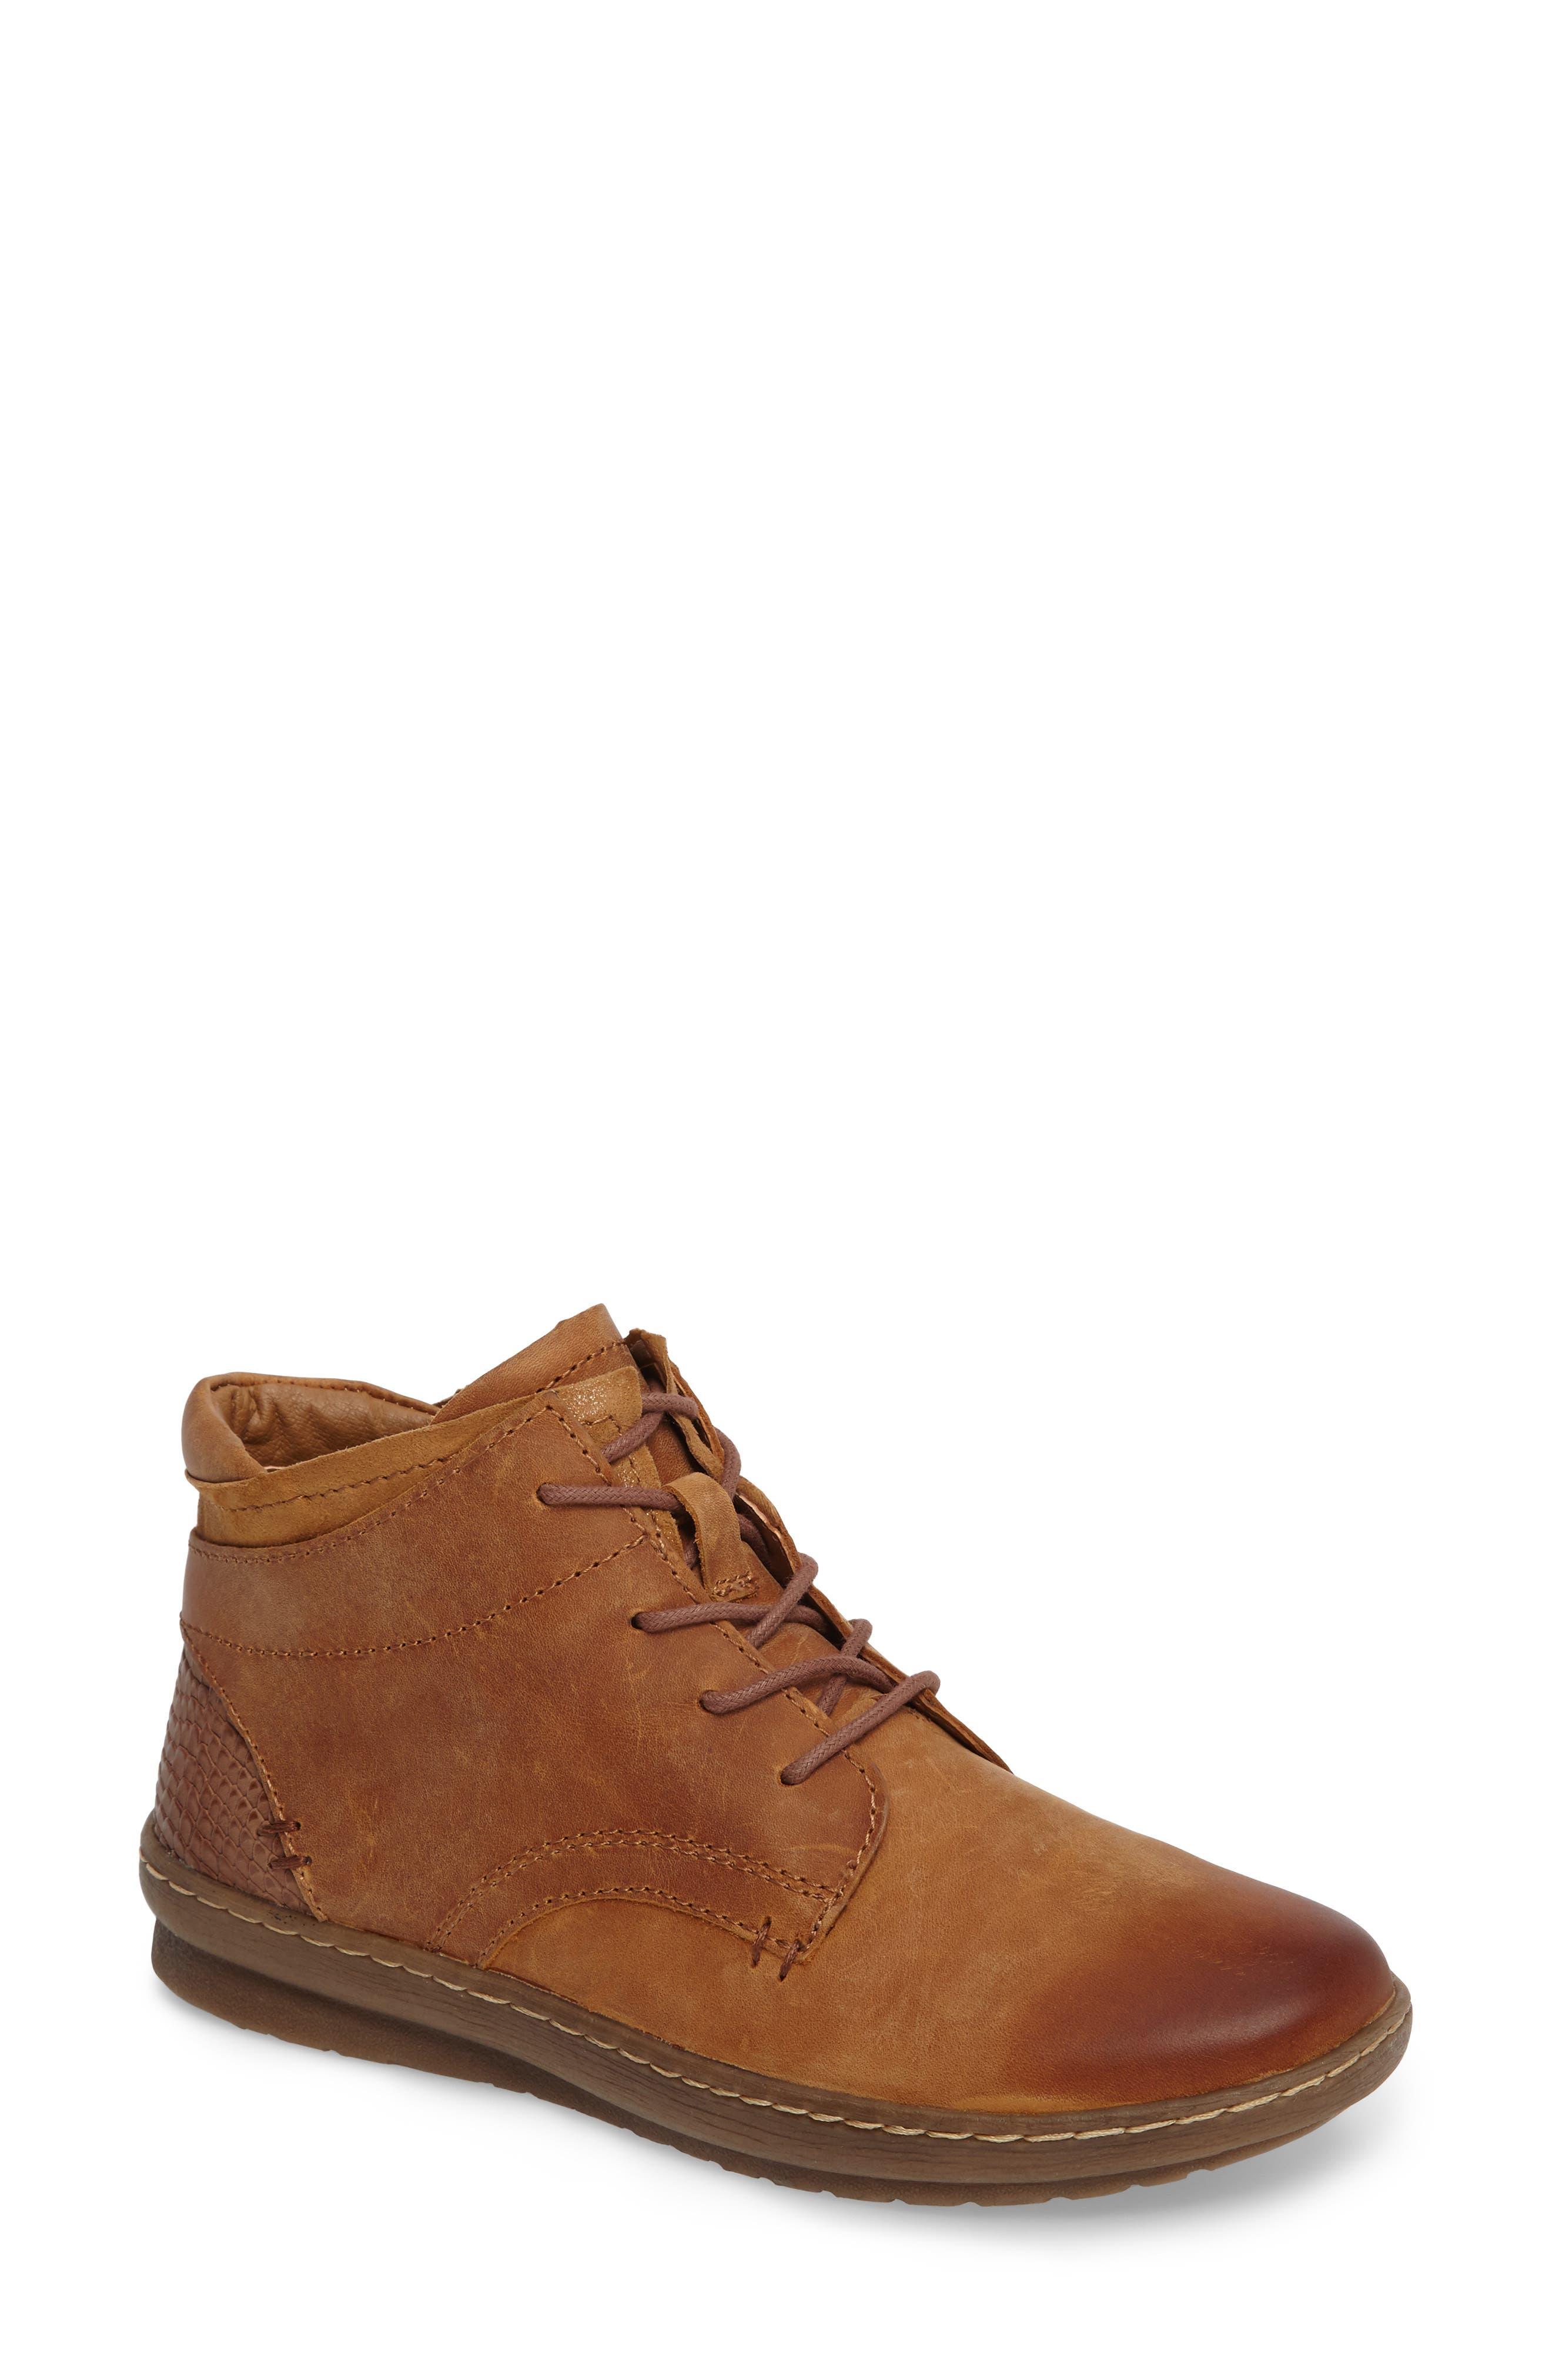 Cascade Boot,                         Main,                         color, Almond Tan Leather